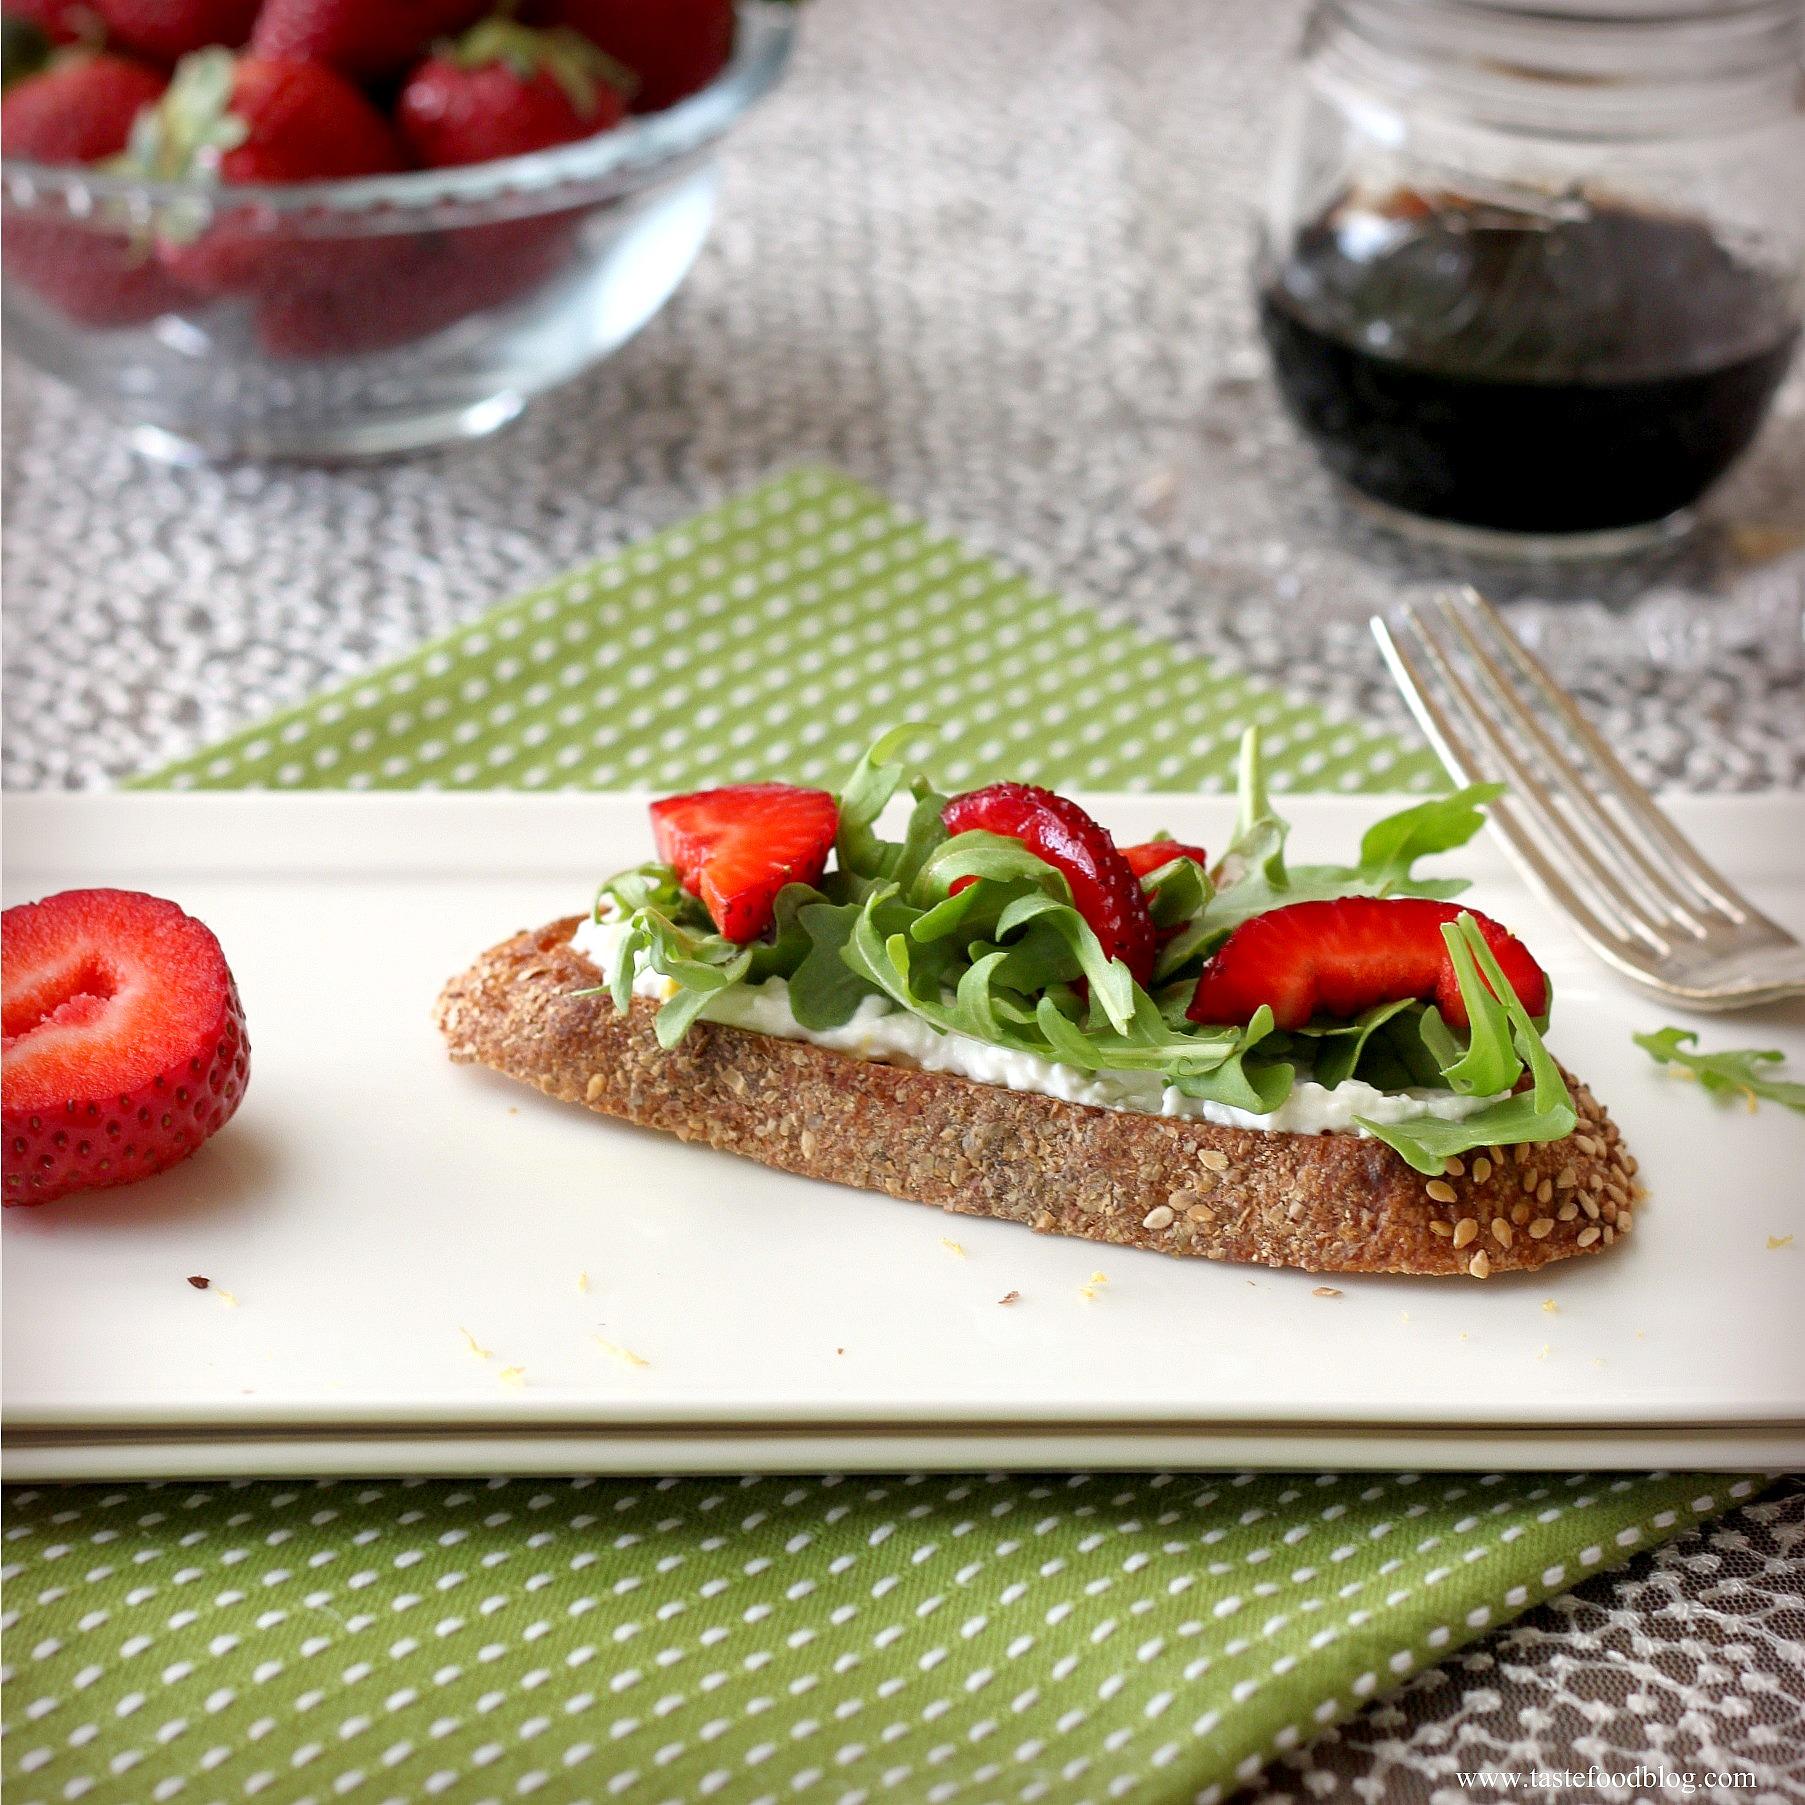 Strawberry Ricotta Bruschetta with Lemon and Arugula ...